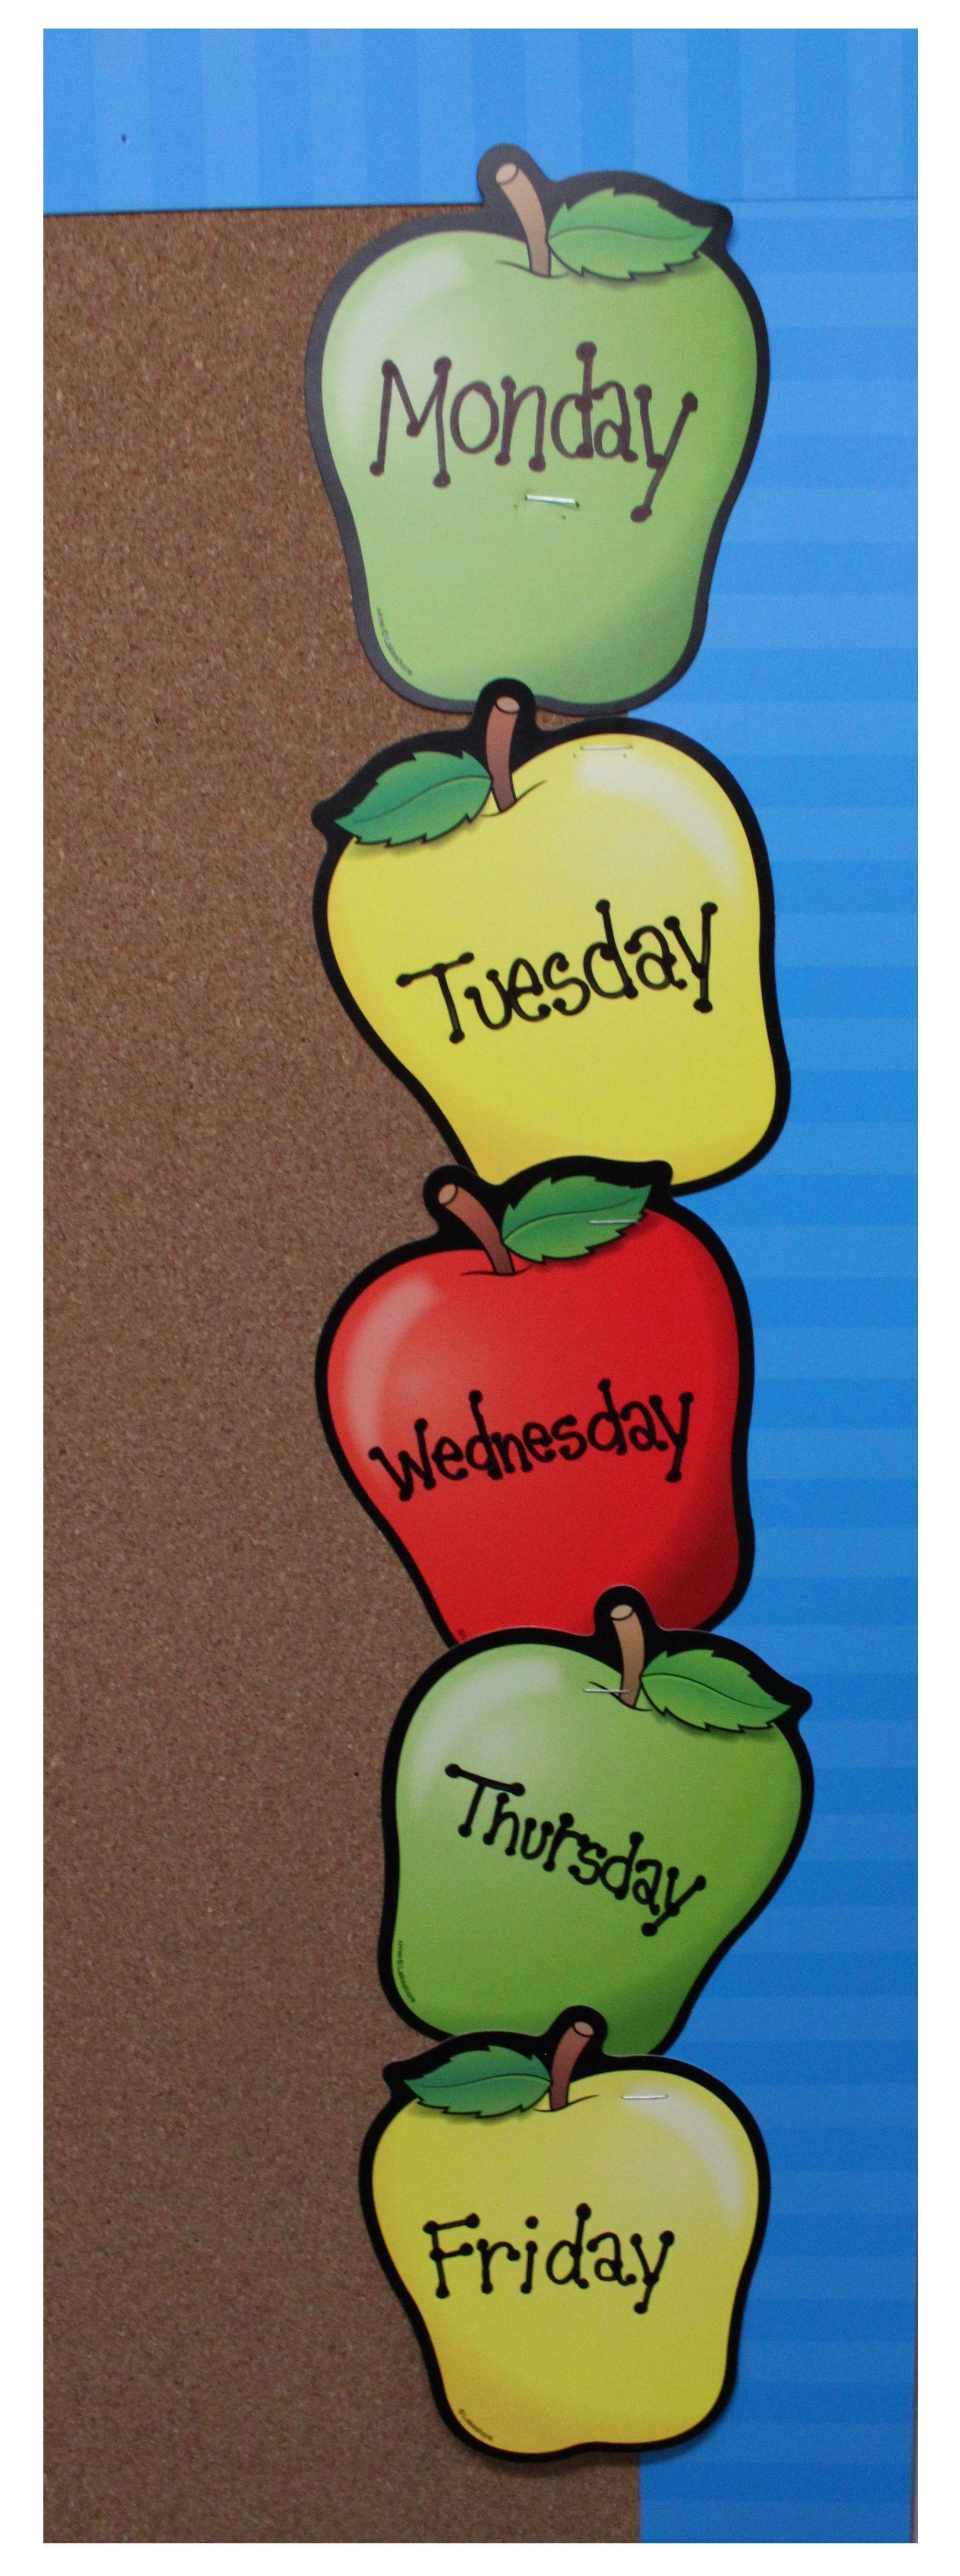 Lakeshore Classroom Decor ~ Lakeshore s colorful apple bulletin board accents bring